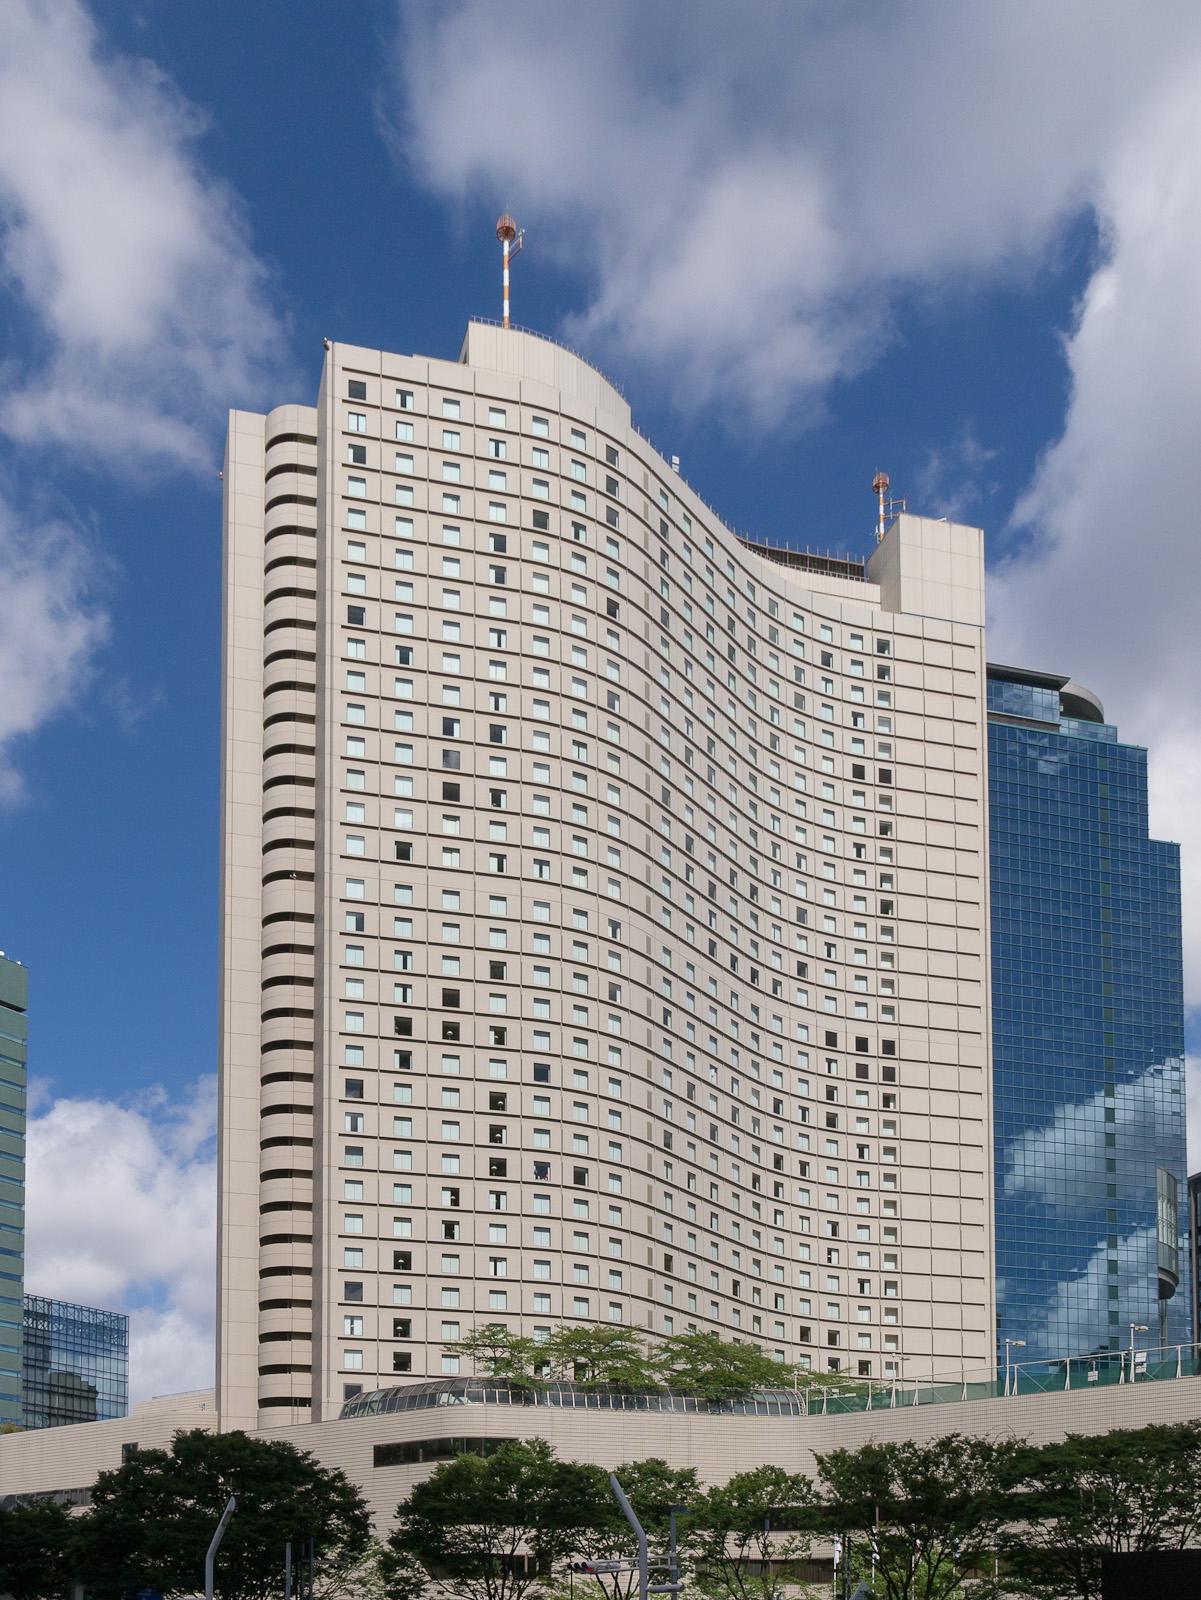 Hilton Hotel Jumeirah